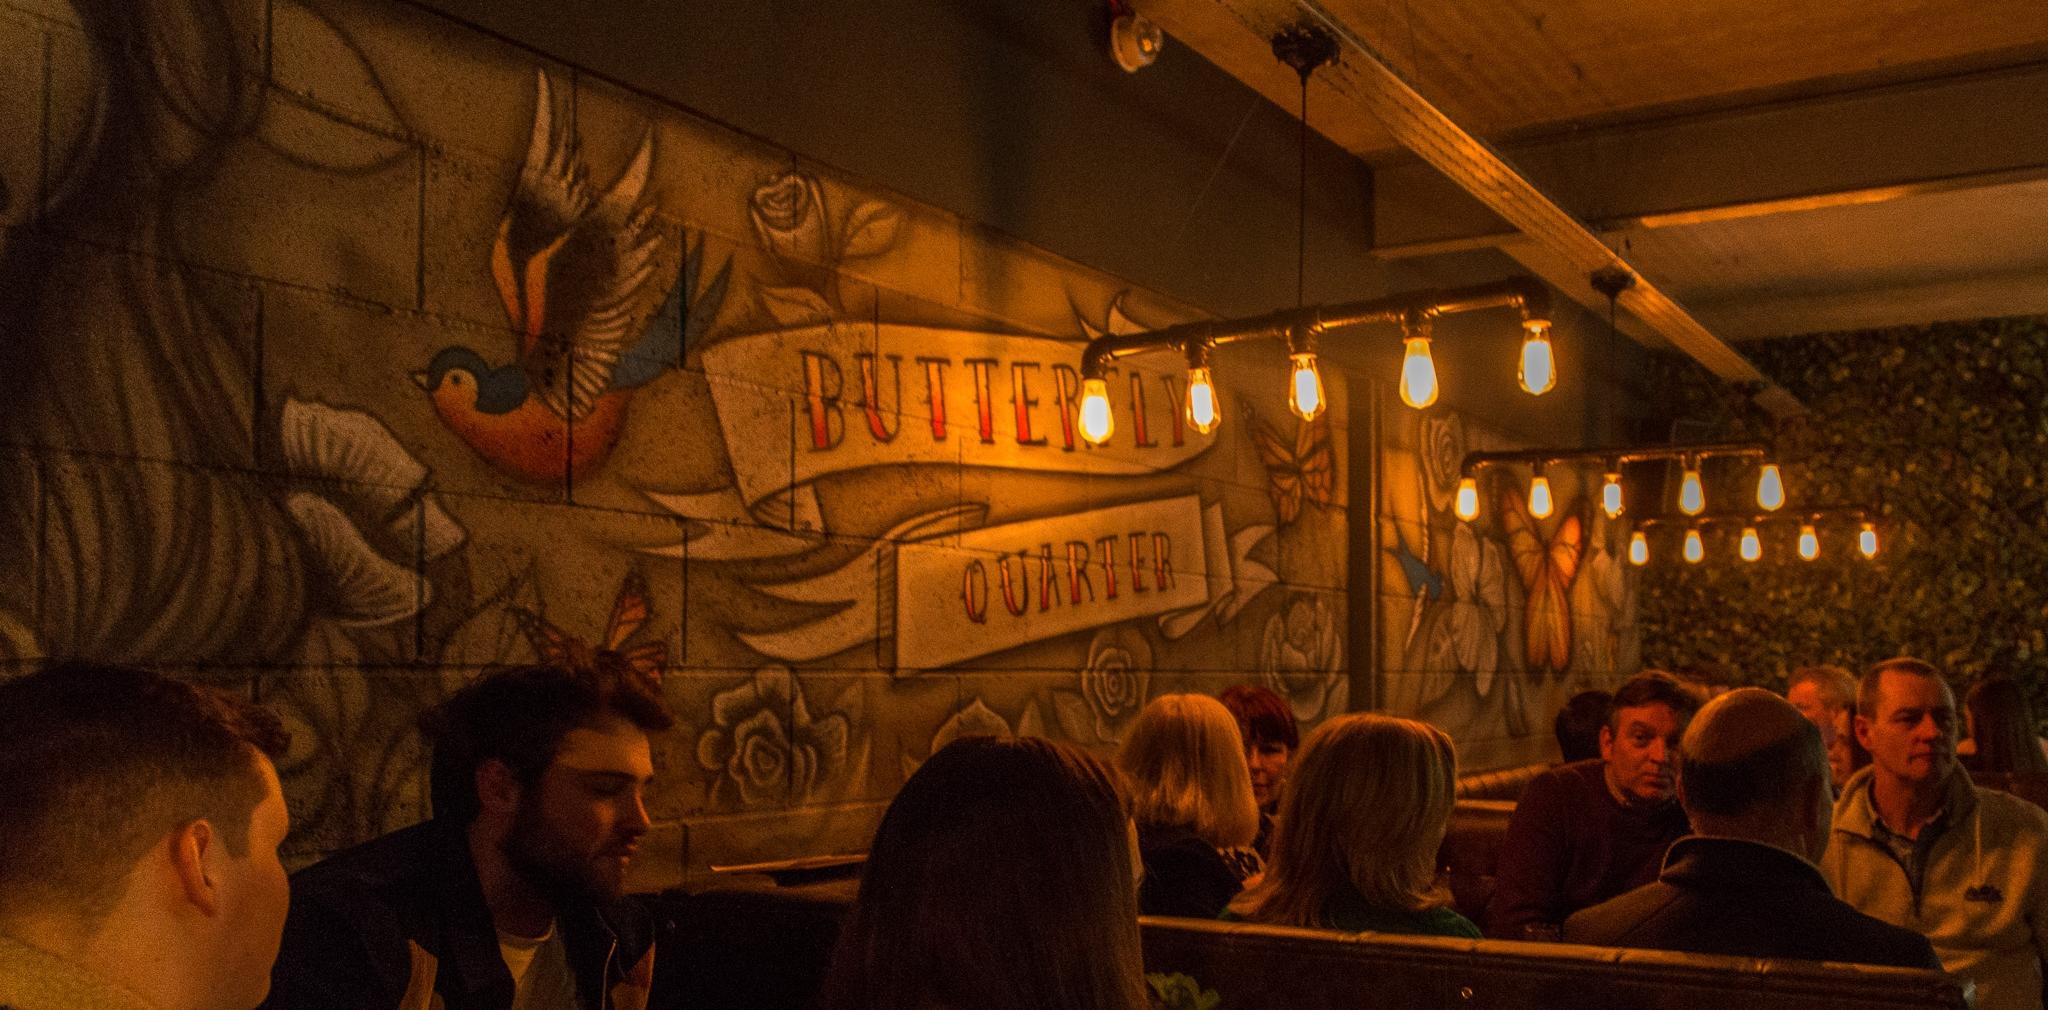 BUTTERFLY QUARTER OPENING NIGHT-13.jpg